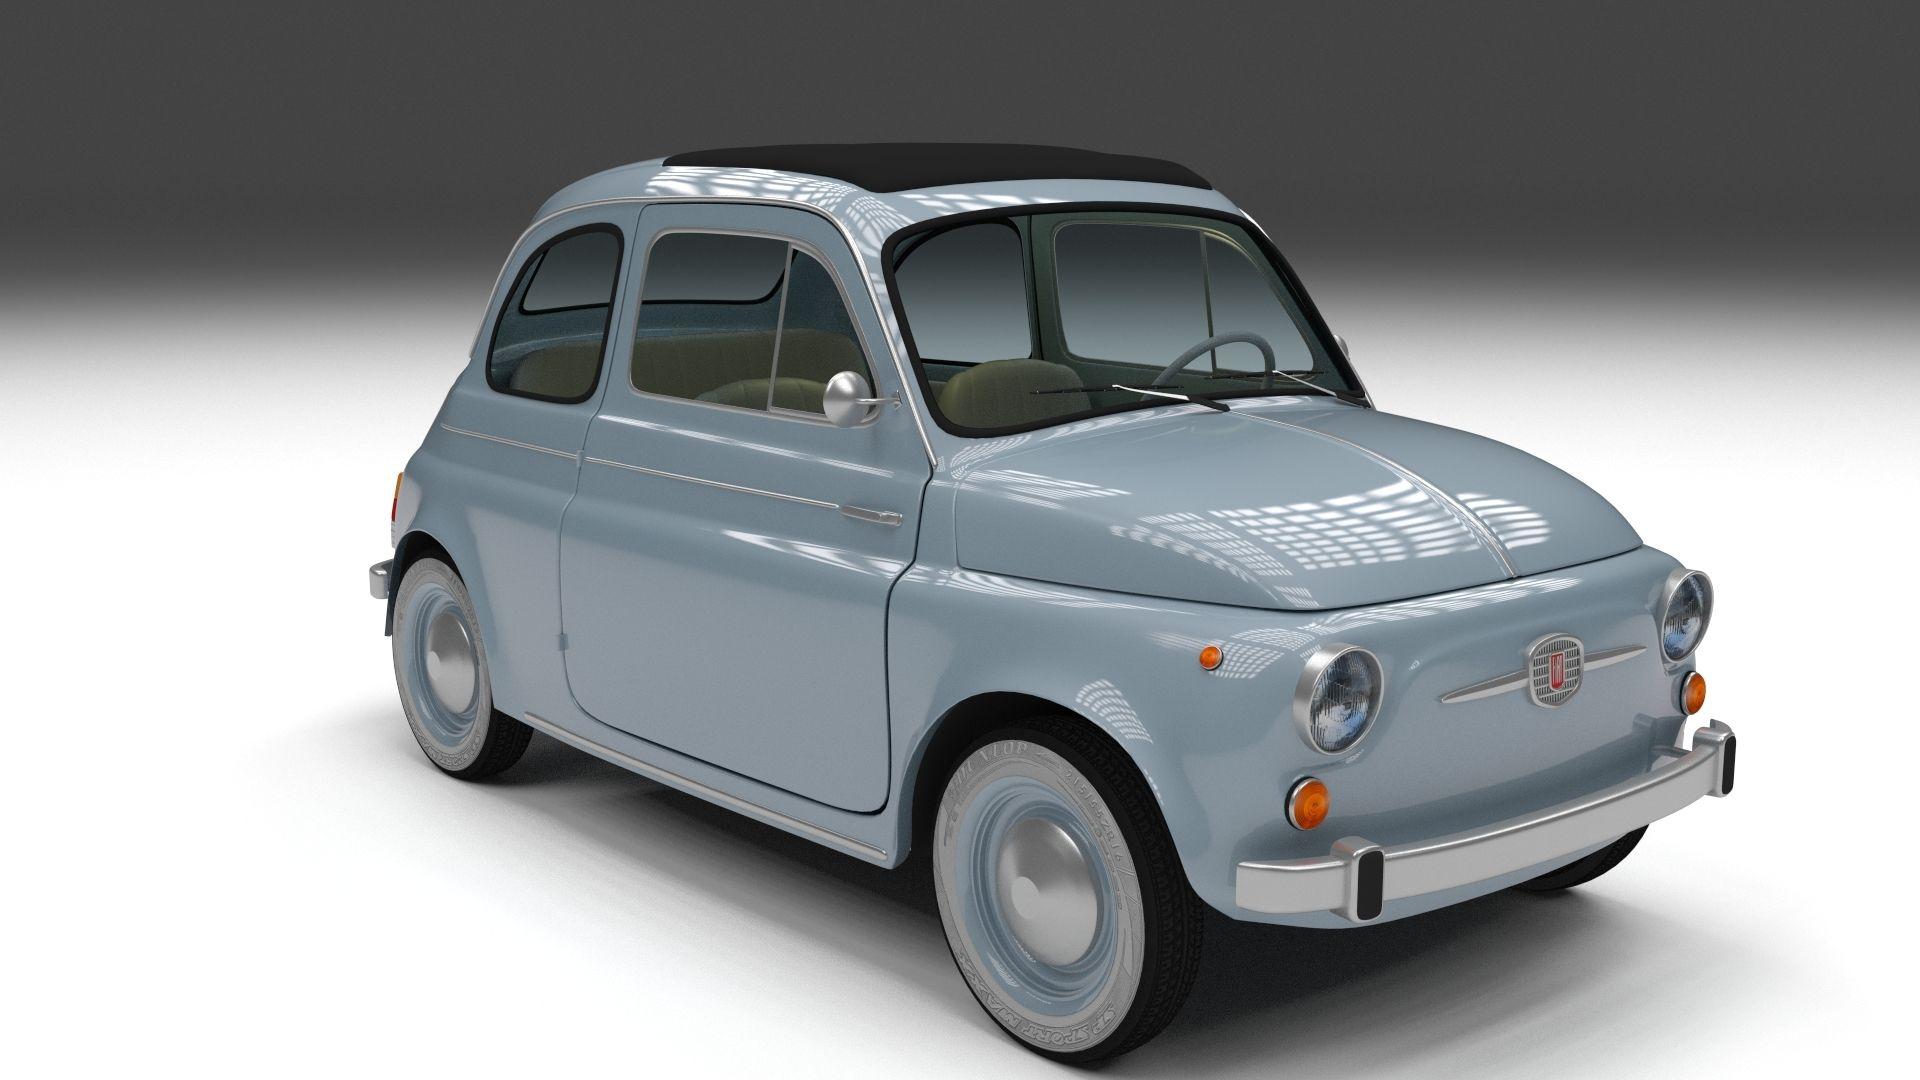 Fiat Nuova 500 1957 Nuova Fiat Fiat 500 Fiat Typography Design